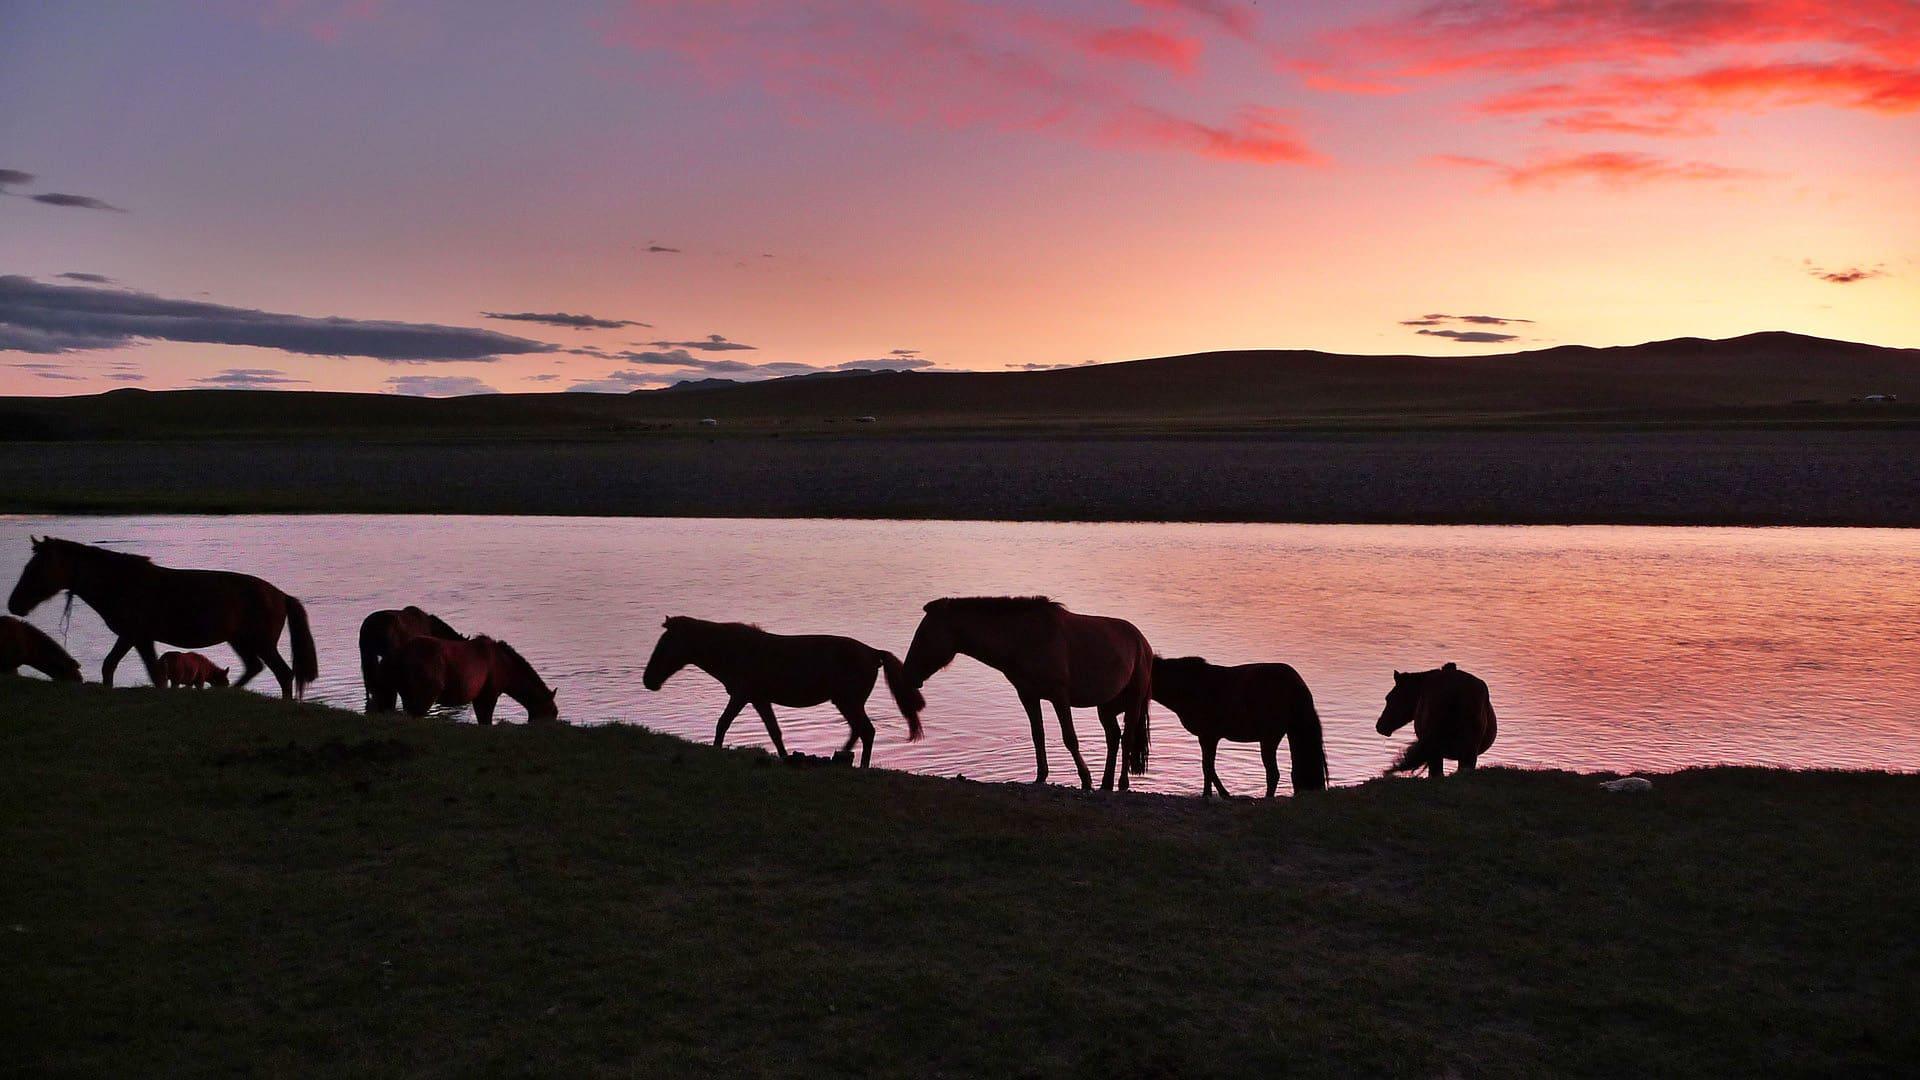 Mongolia sunset and horses